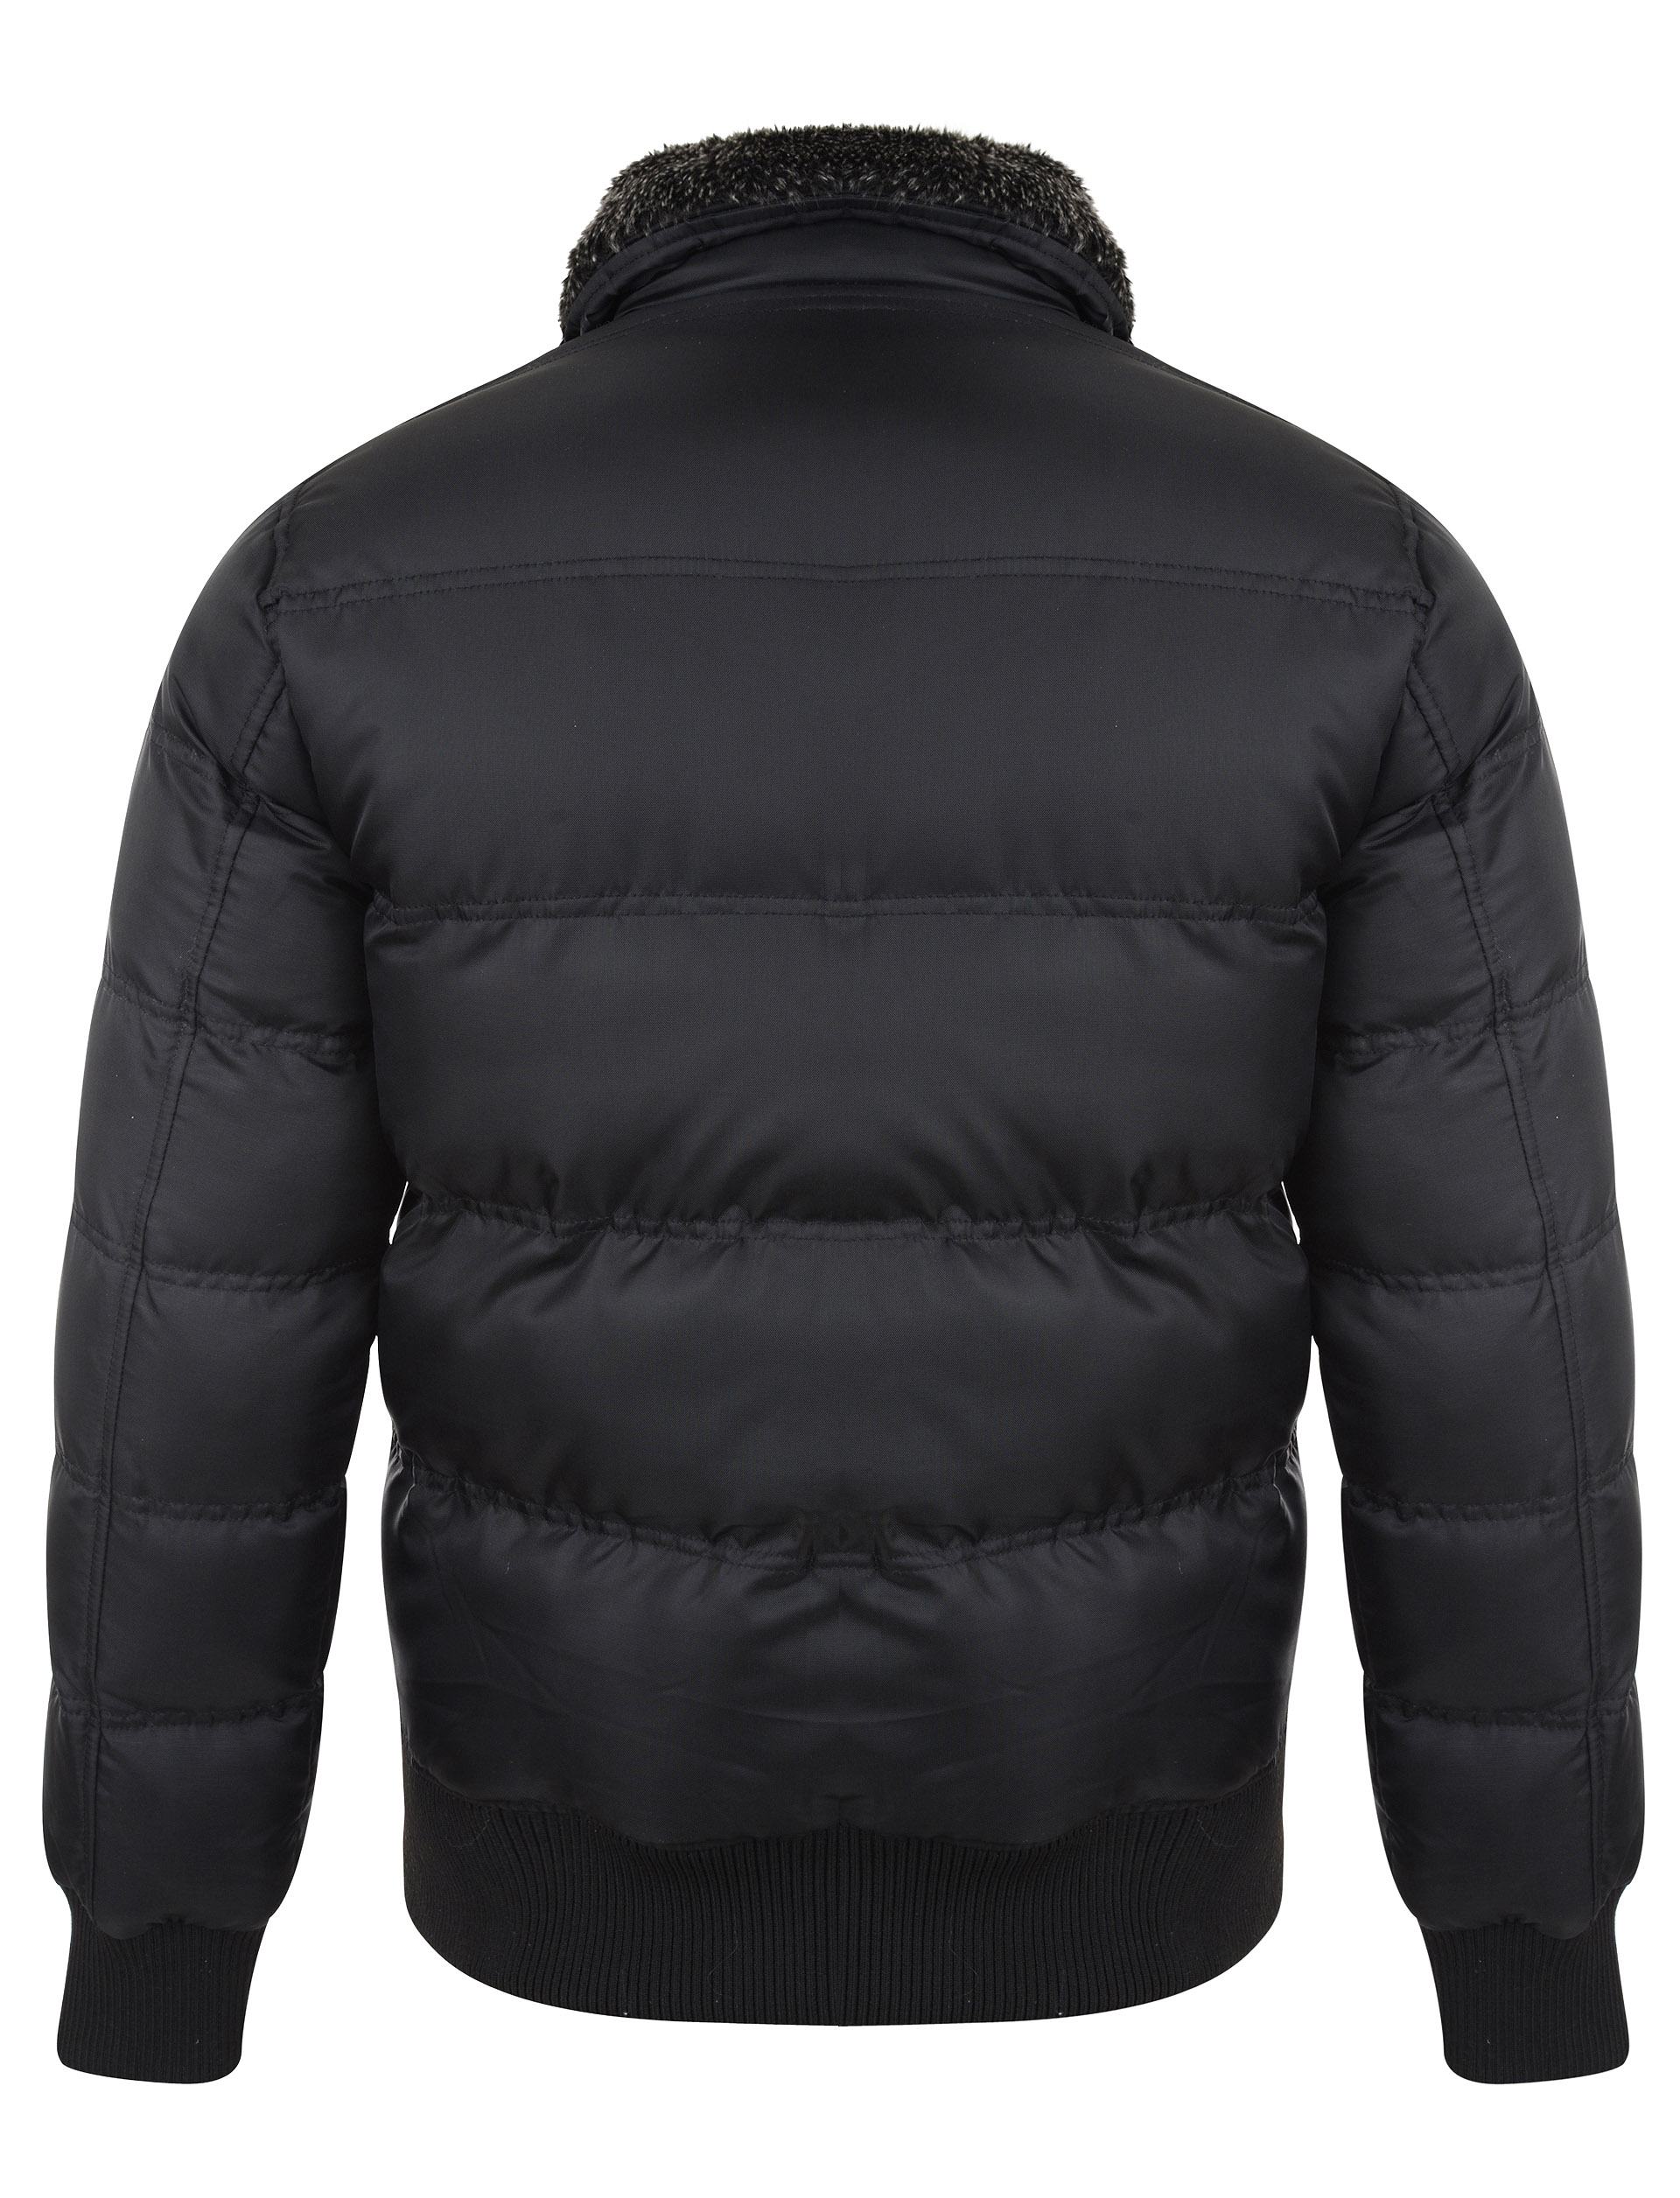 D Struct Mens Moston Padded Puffer Jacket Designer Button Up Windbreaker Coat